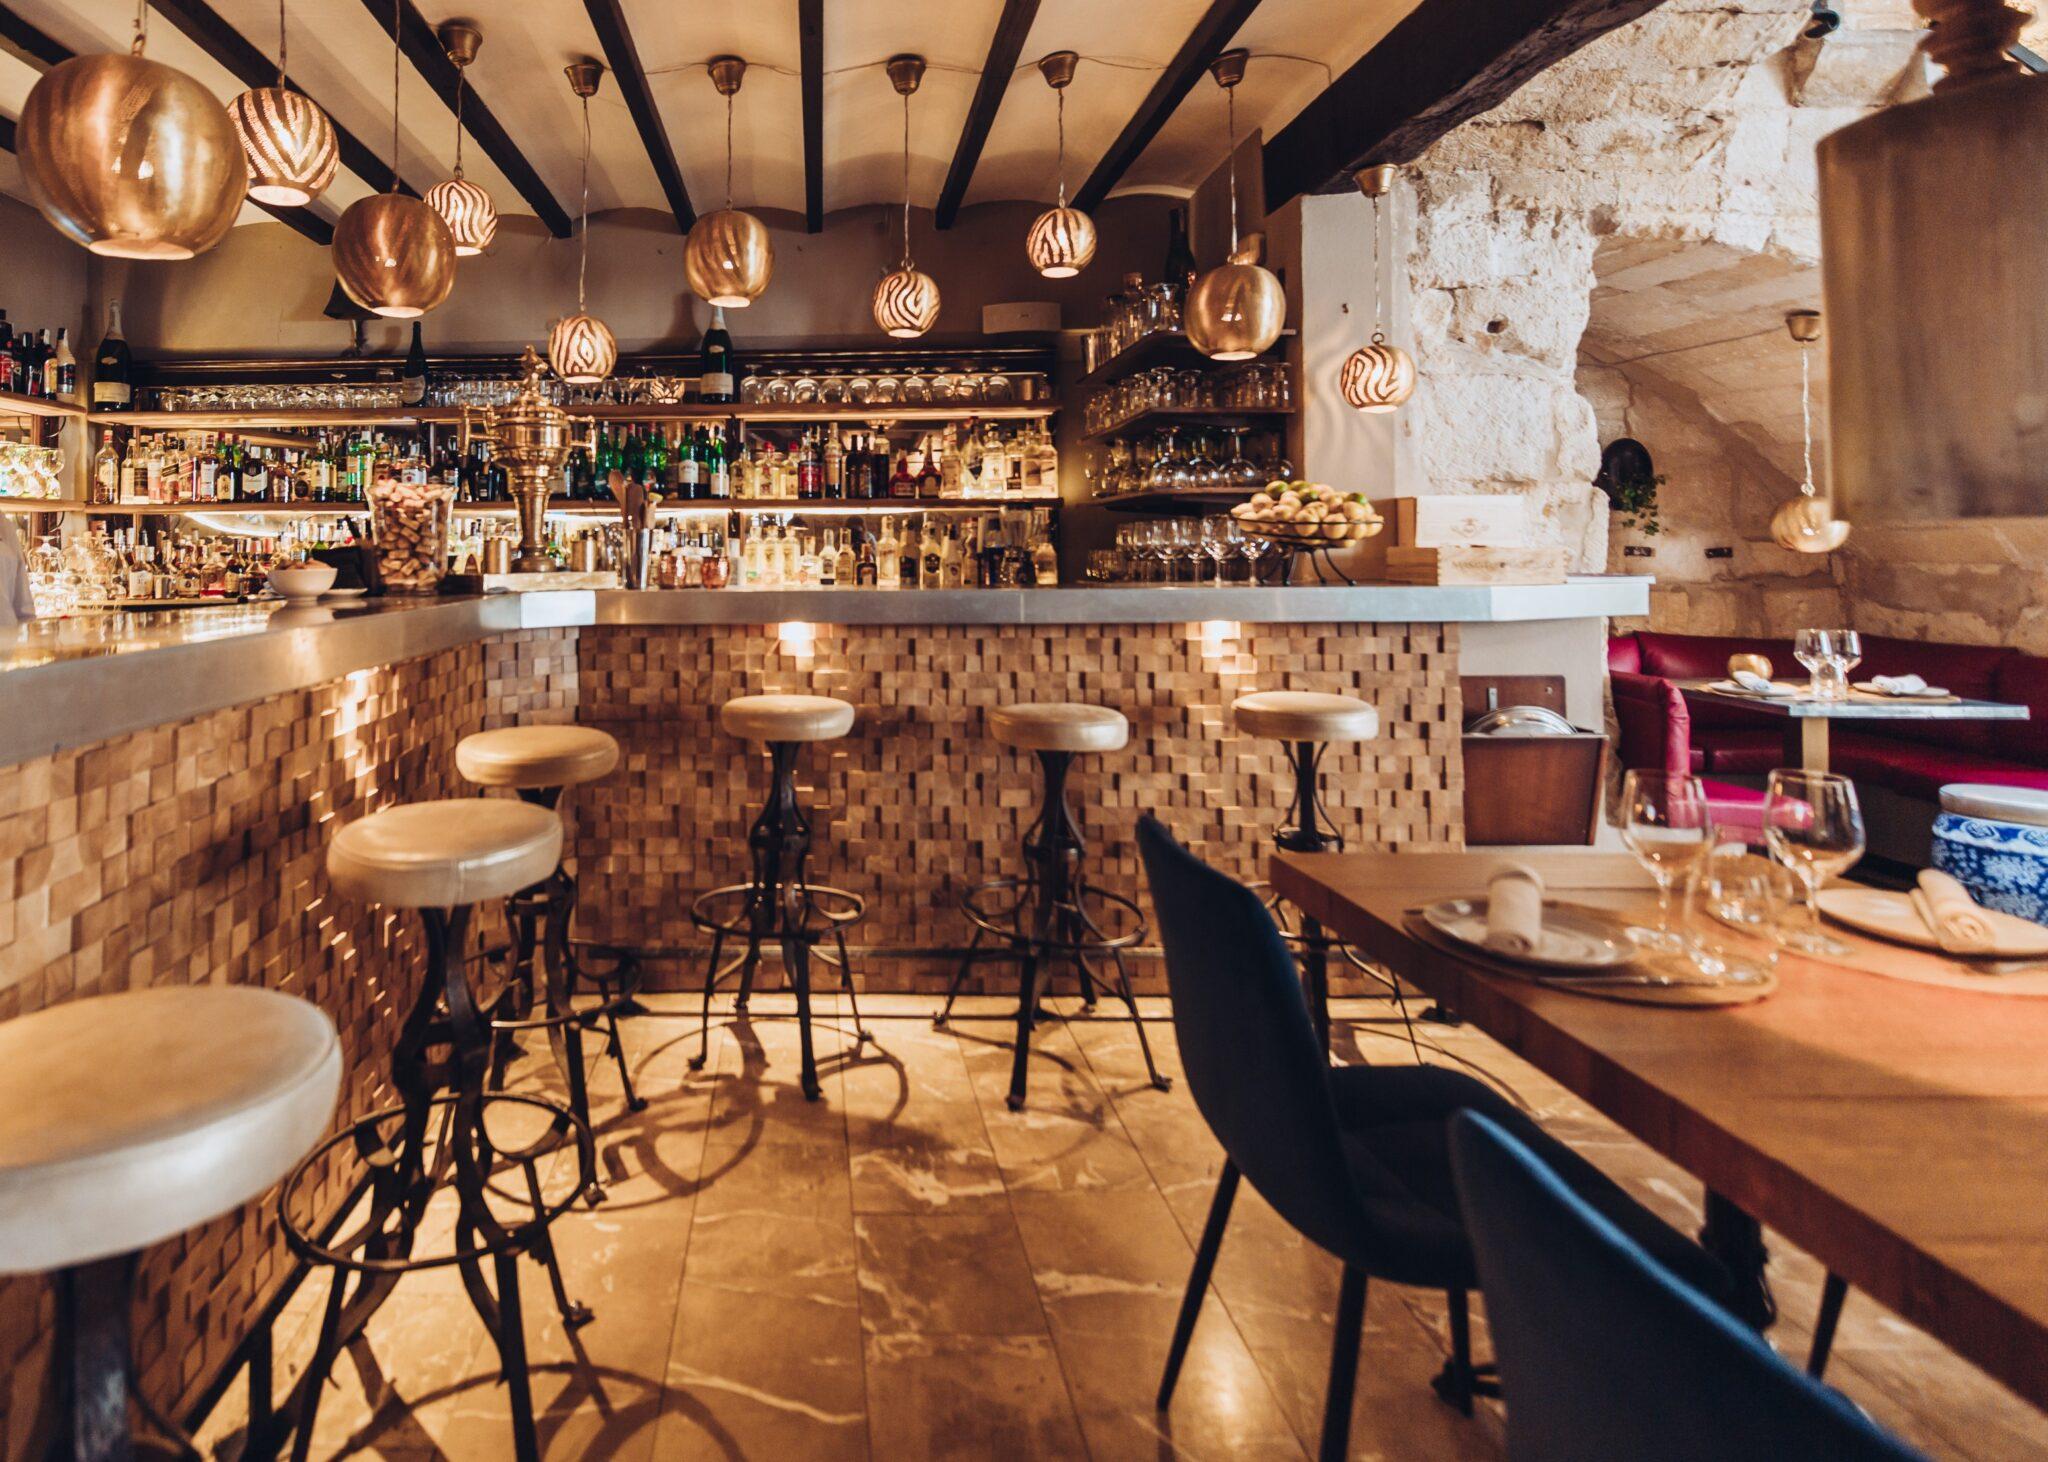 Make a reservation – Spanish